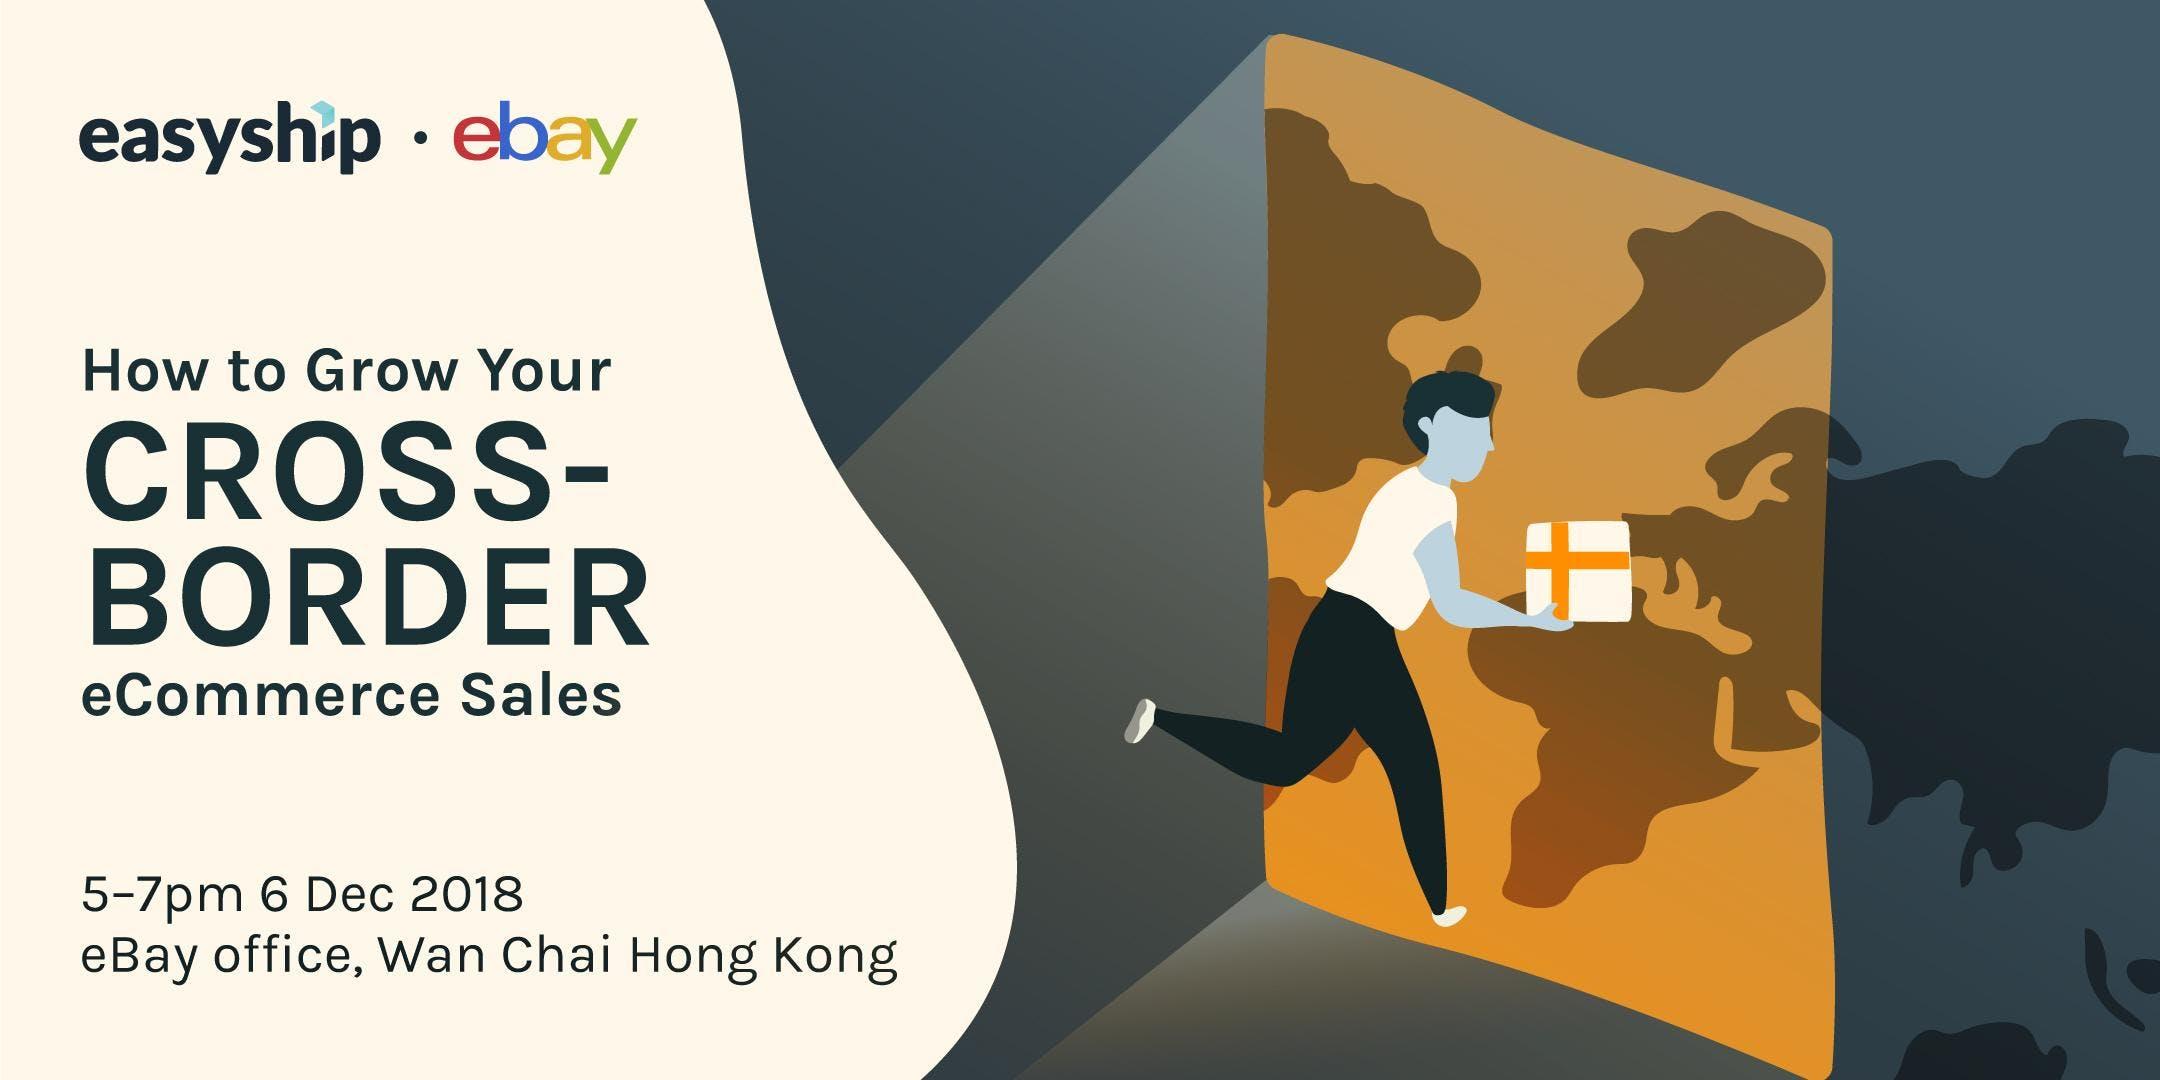 How To Grow Your Cross Border Ecommerce Sales 6 Dec 2018